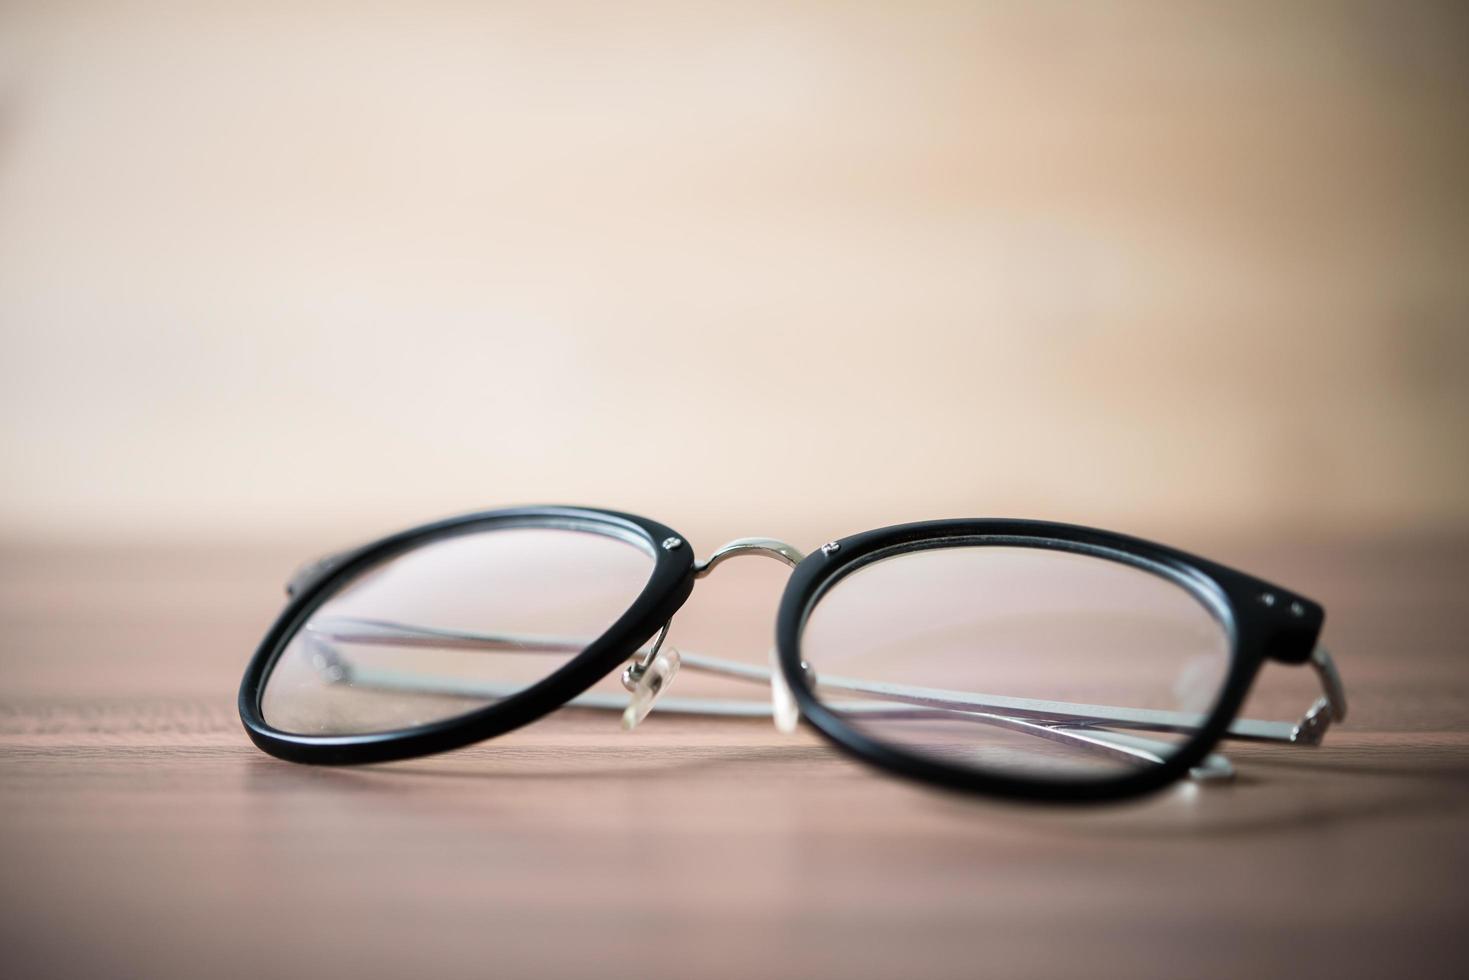 Close-up of black glasses photo